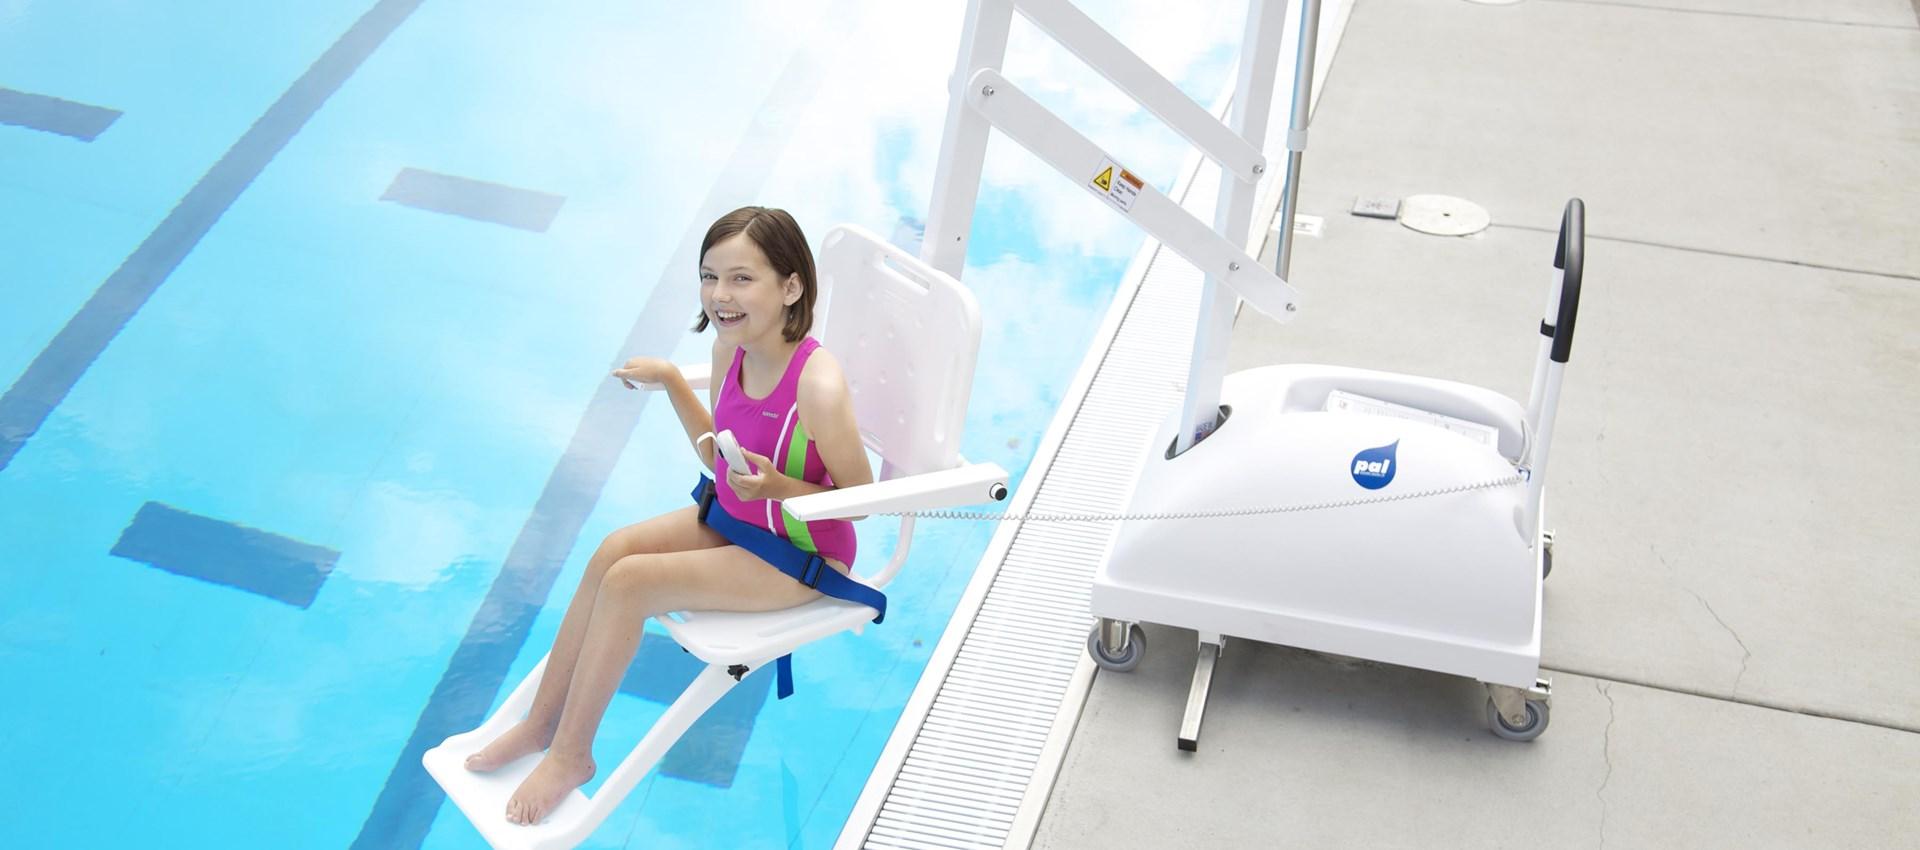 rmt-pal-pool-hoists-disabled-access.jpeg